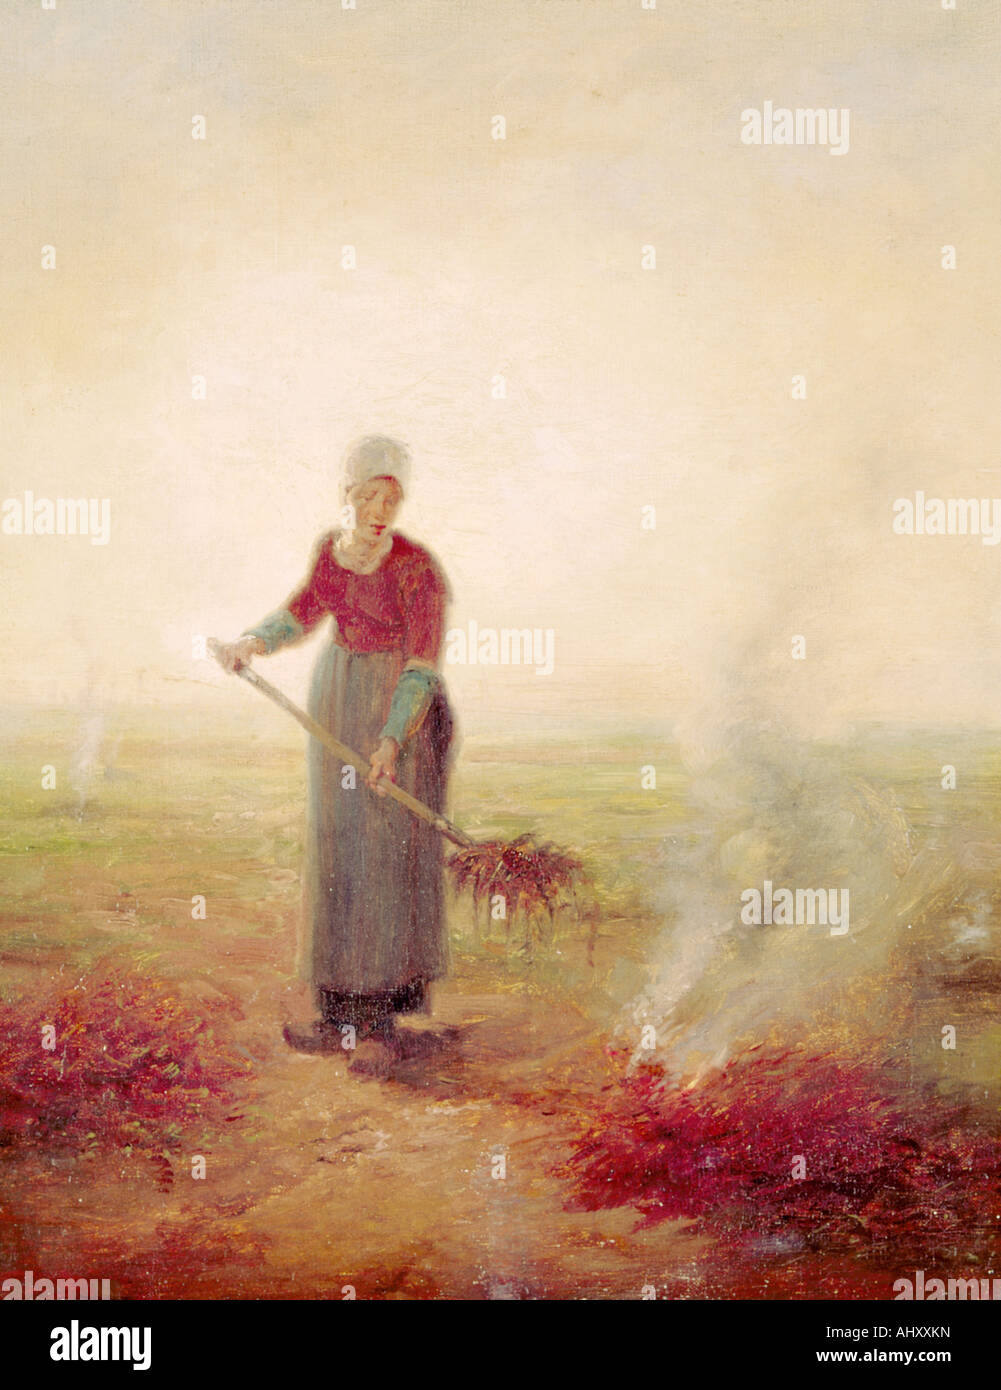 Bellas artes, mijo, Jean-Francois (1814 - 1875), pintura, joven farmgirl, Musée d'art et d'histoire, Imagen De Stock